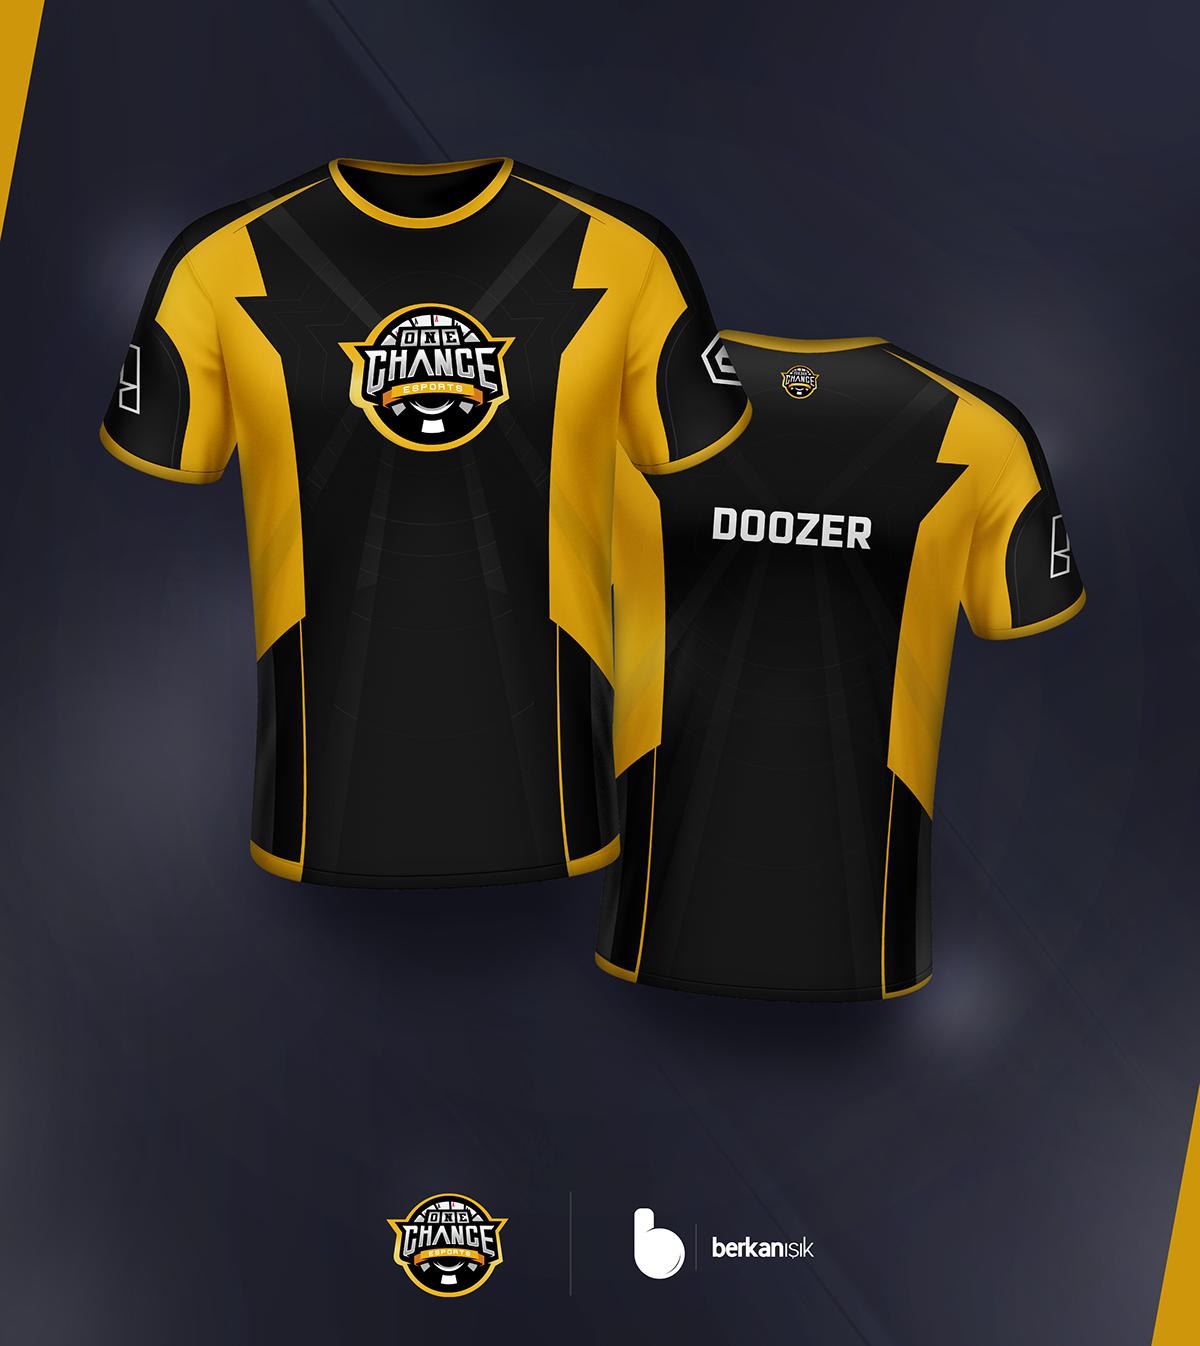 Download Onechance Esports Jersey Design On Behance Jersey Design Sports Shirts Custom Polo Shirts